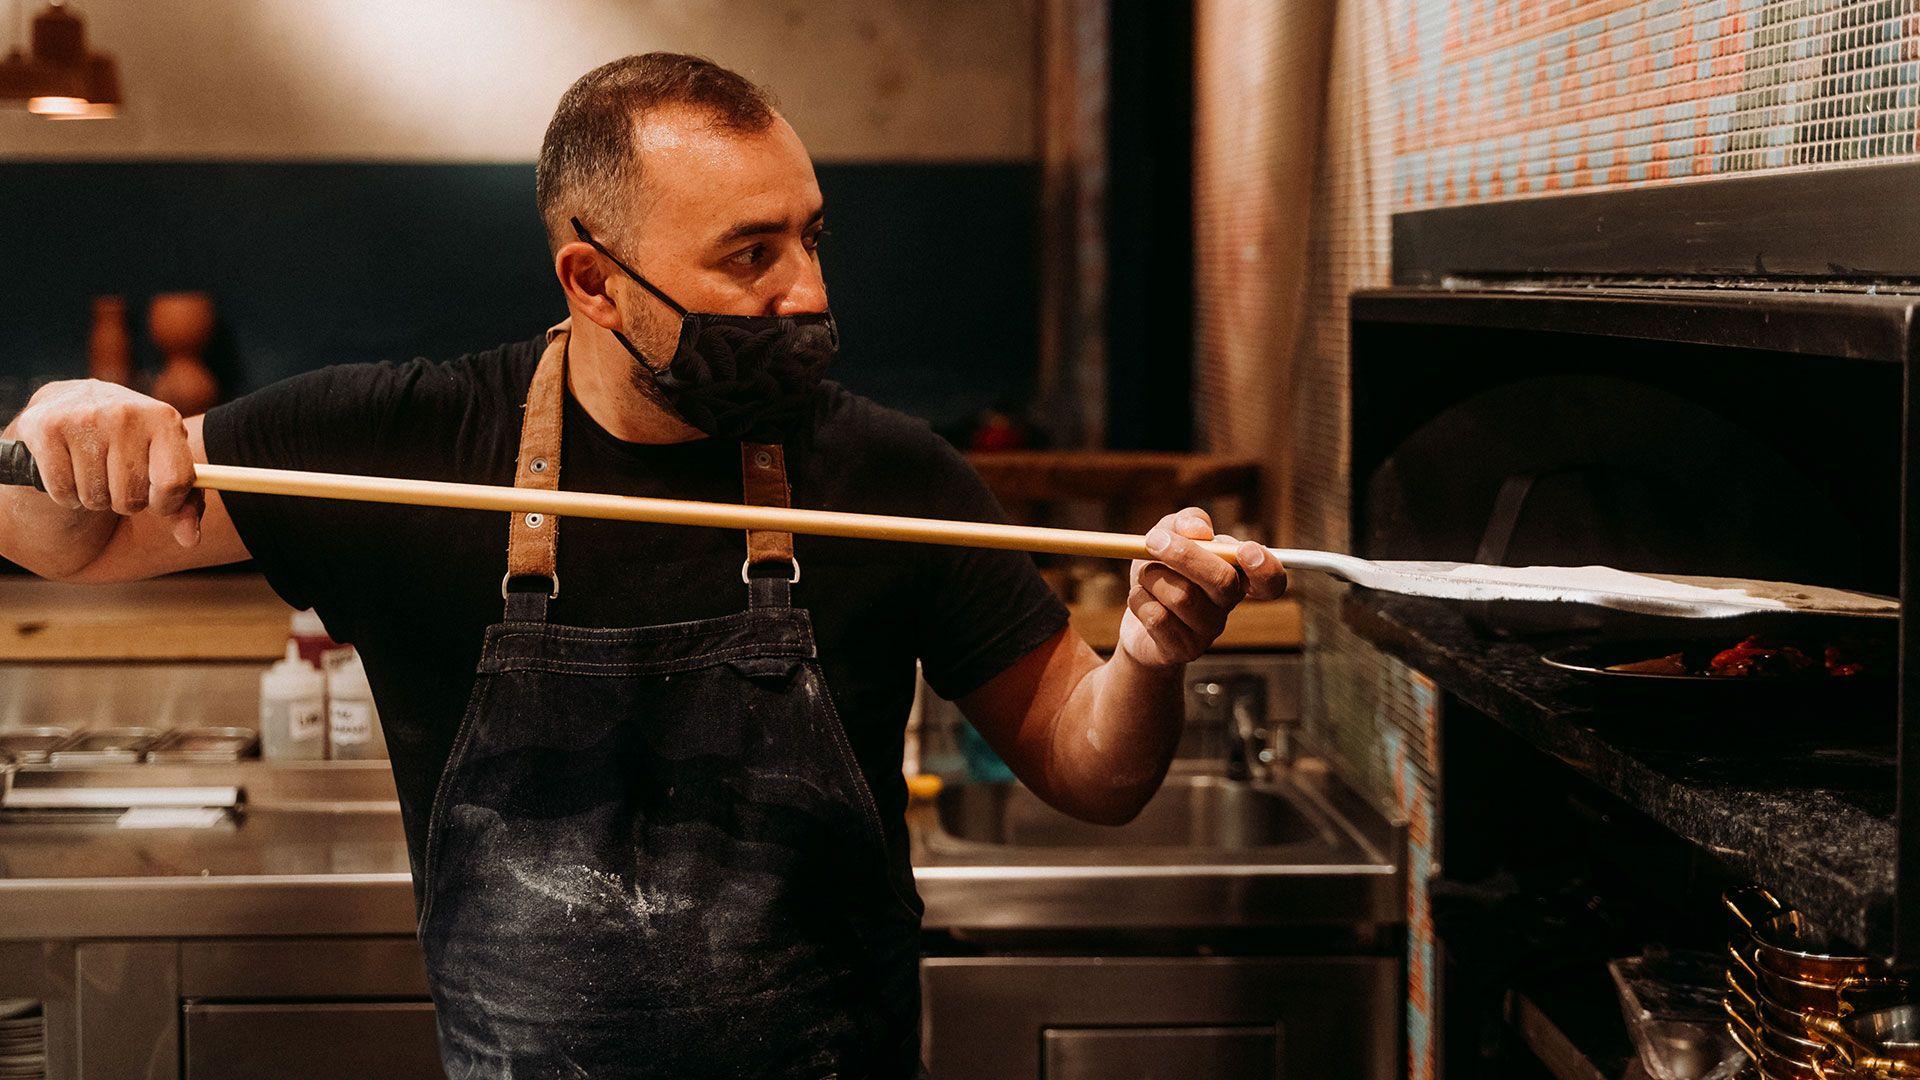 Pan casero cocina abierta oriente medio brasas Restaurante eixample sumac & mambo